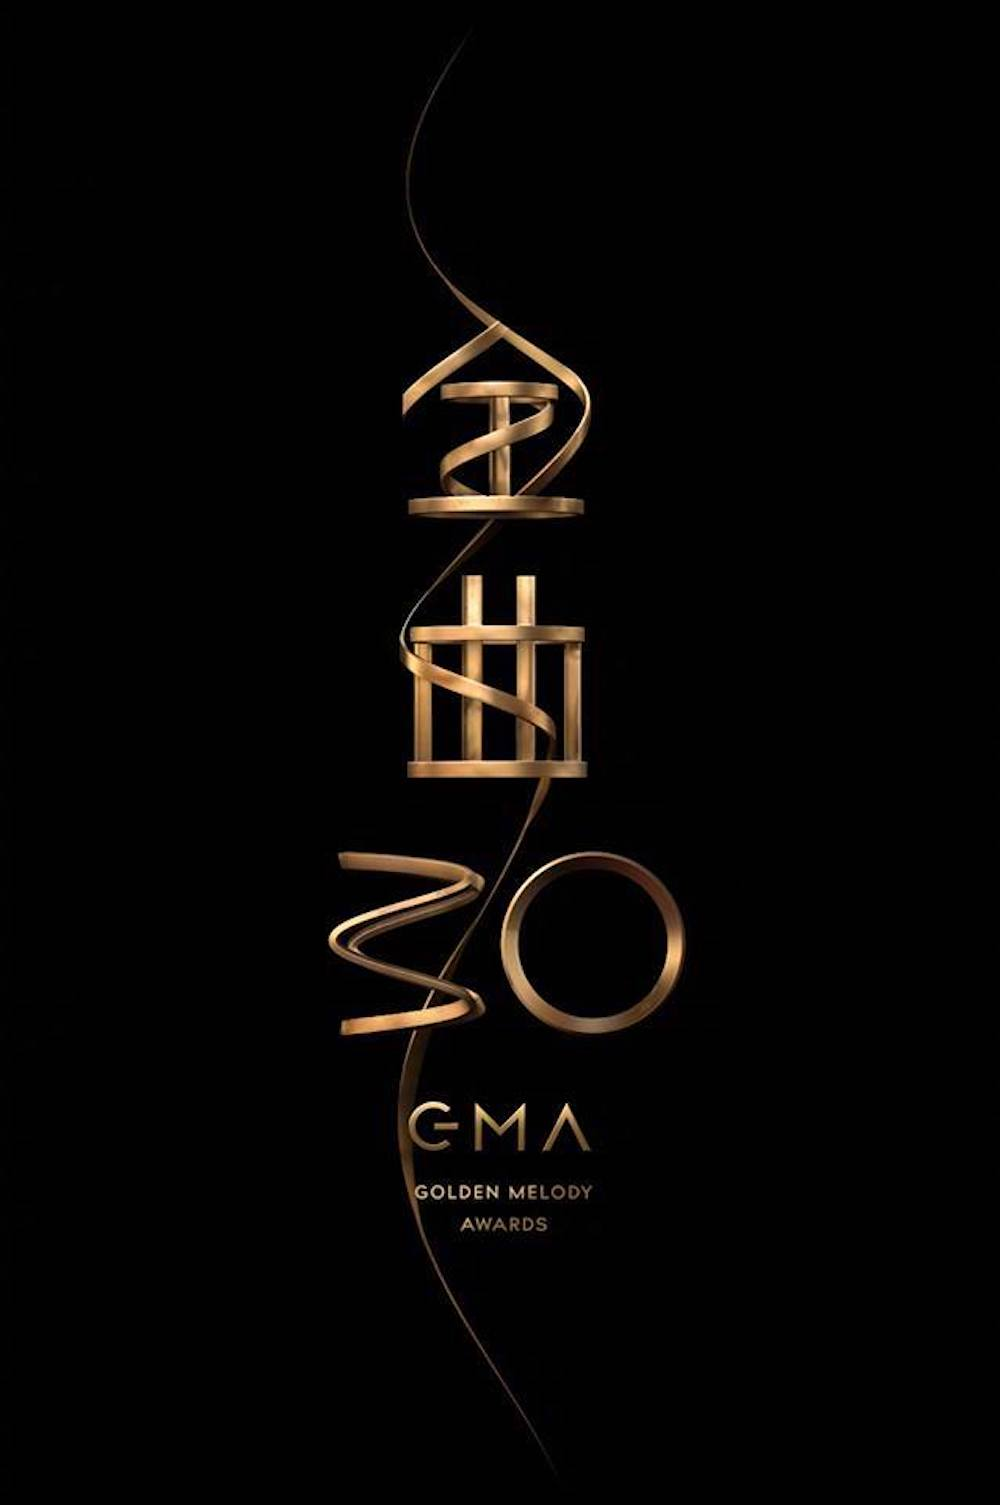 30th Golden Melody Awards – 第30届金曲奖